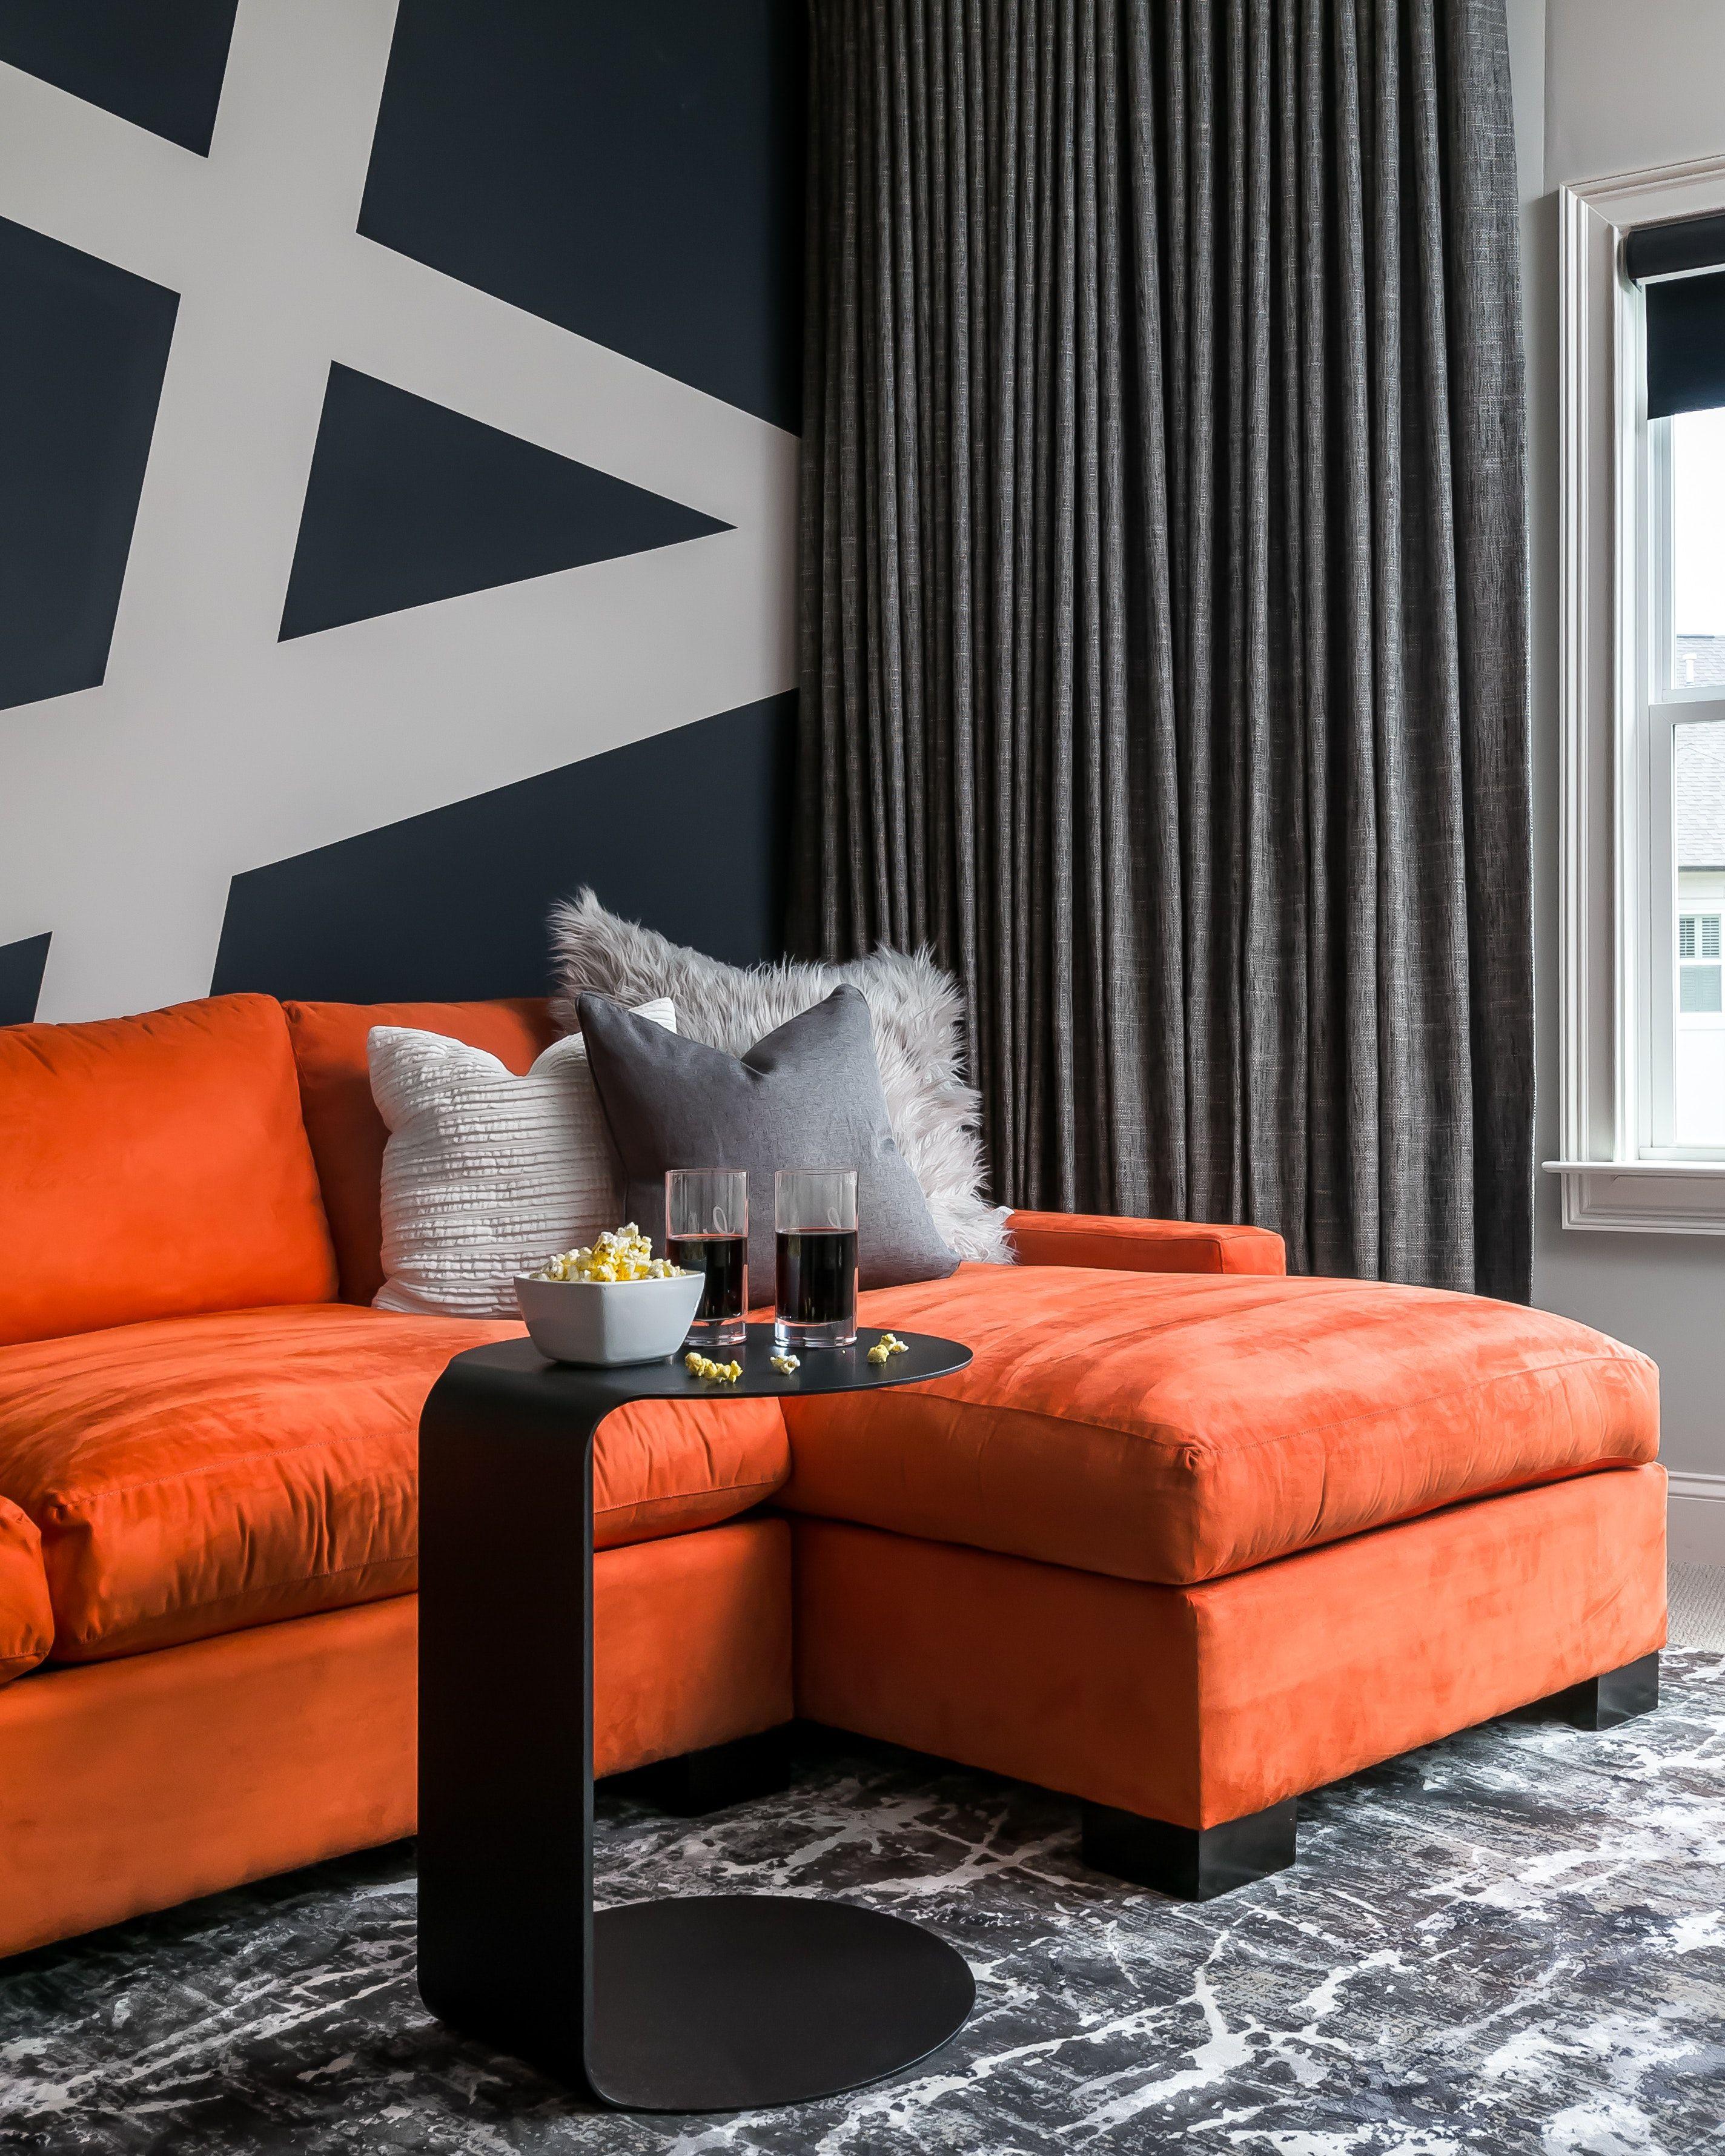 Media Room With Graphic Wall And Colorful Sofa Atlanta Ga Orange Sofa Sofa Colors Vintage Style Sofas